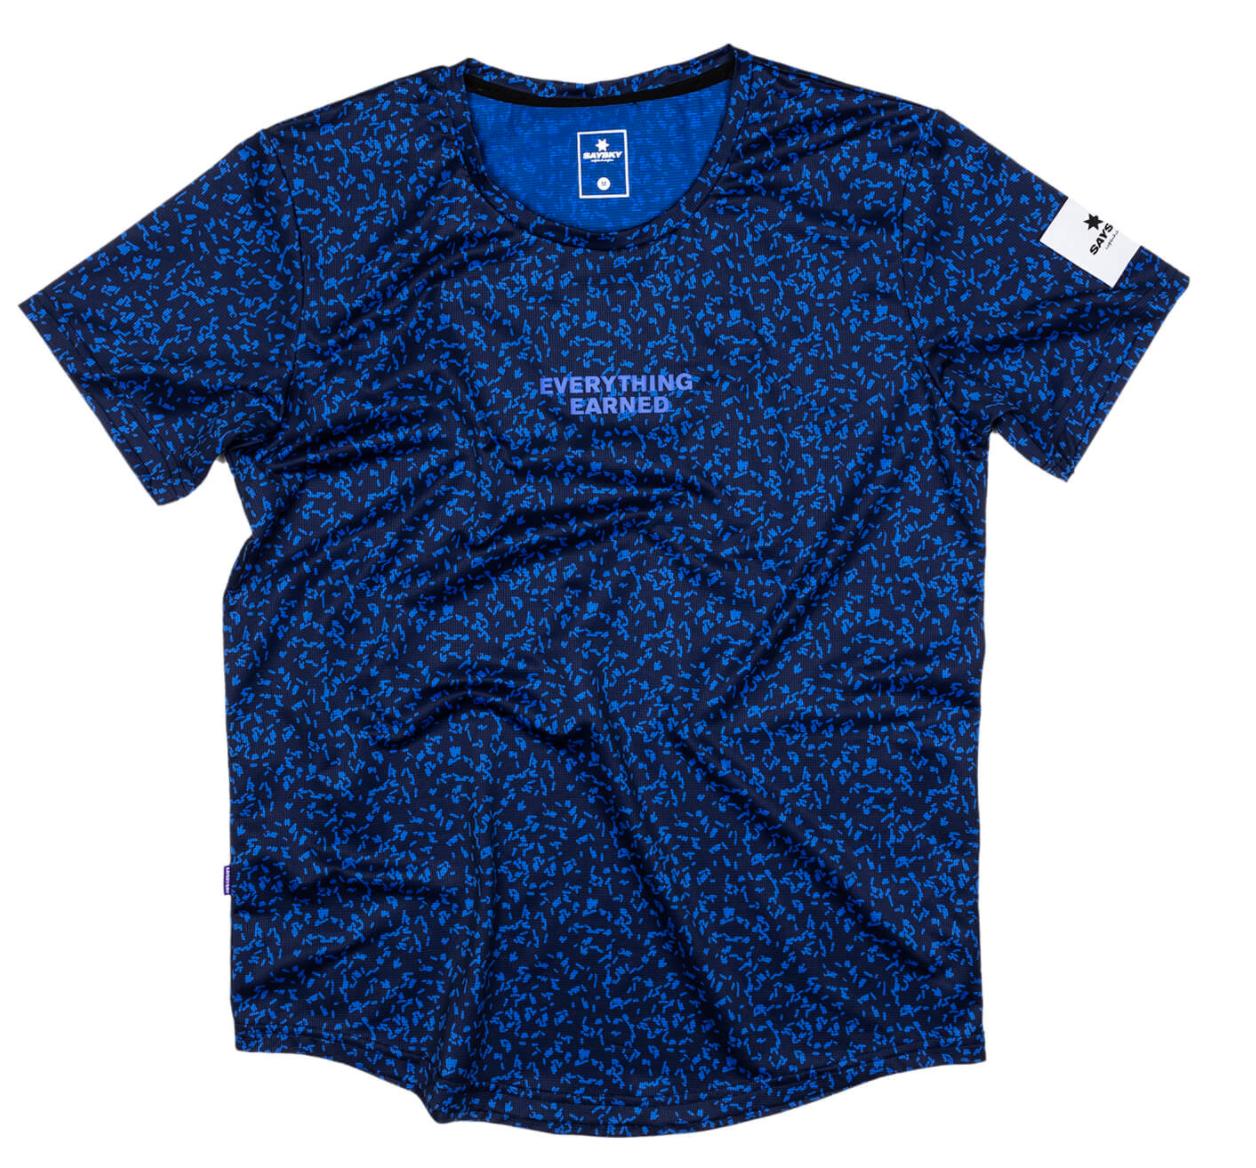 【10%OFF】SAYSKY セイスカイ ランニングTシャツ FTP Combat Tee - BLUE MICROBES PRINT [ユニセックス] FMRSS12 2021S New Arrival Running T-shirts Unisex